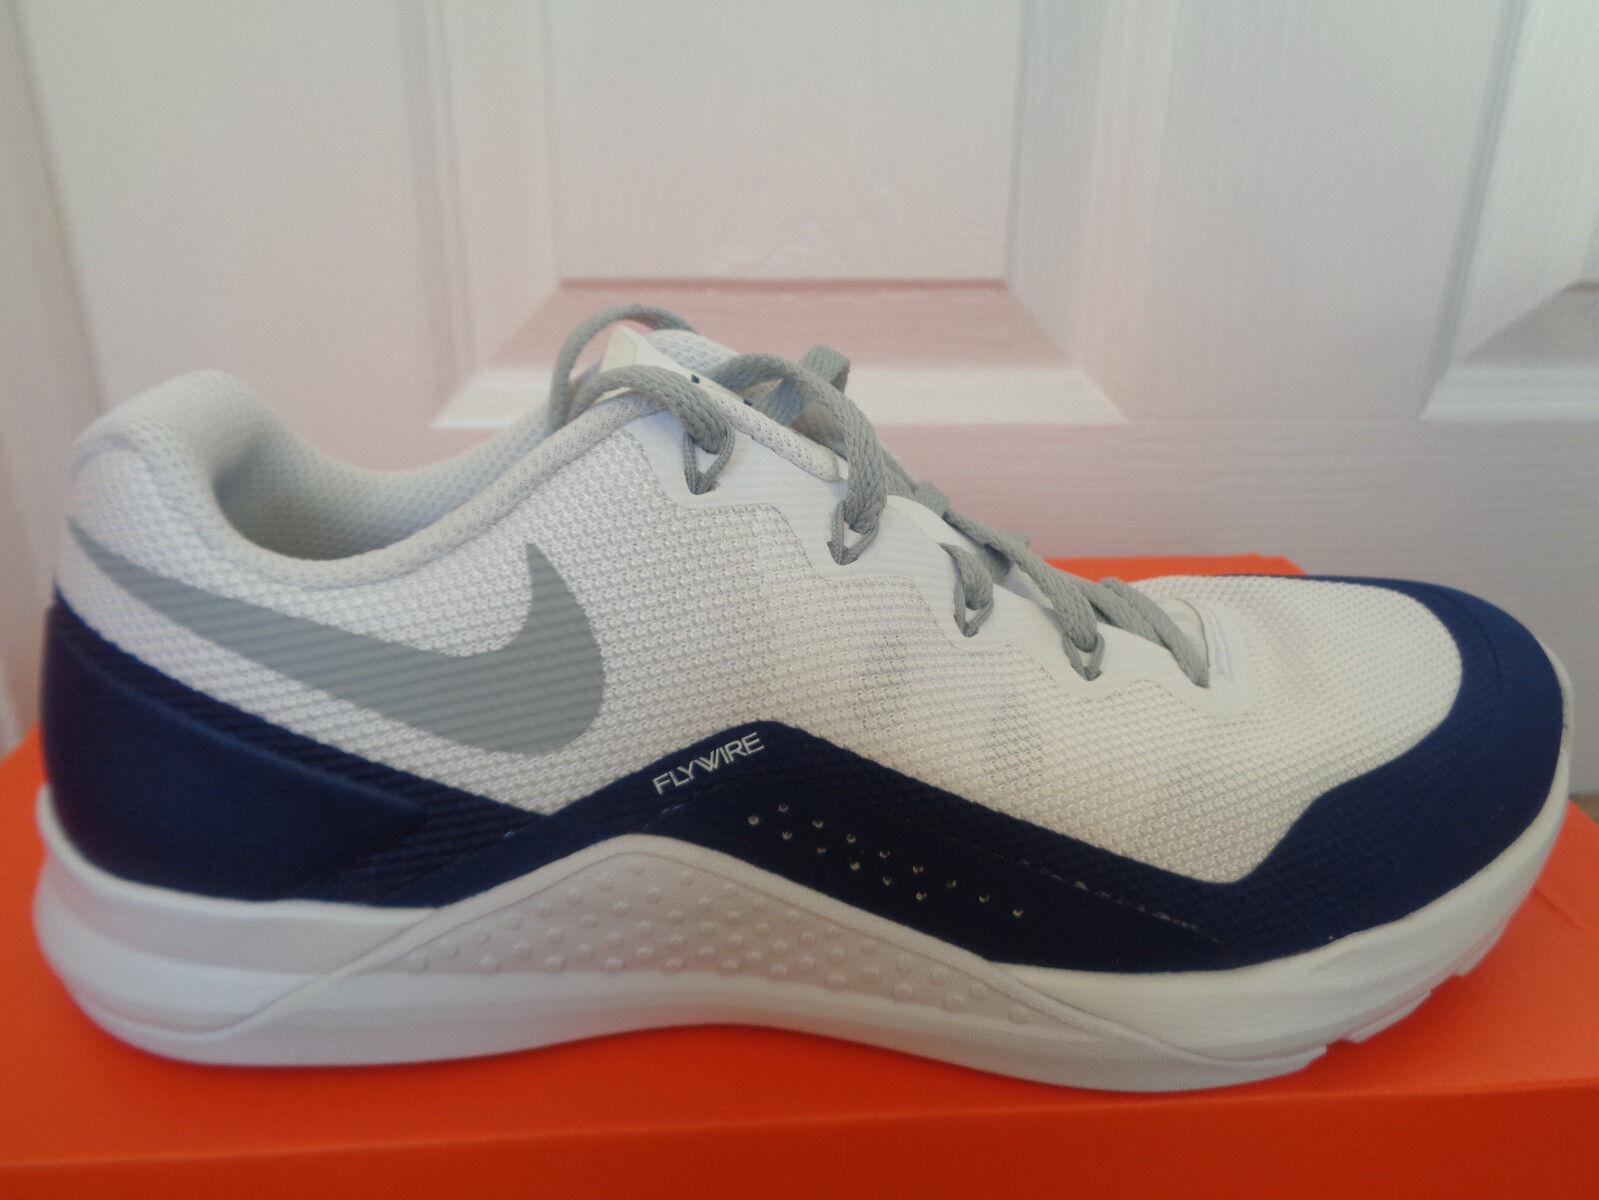 Nike Nike Nike Metcon Repper DSX womens trainers 902173 102 uk 5.5 eu 39 us 8 NEW+BOX 60f15b